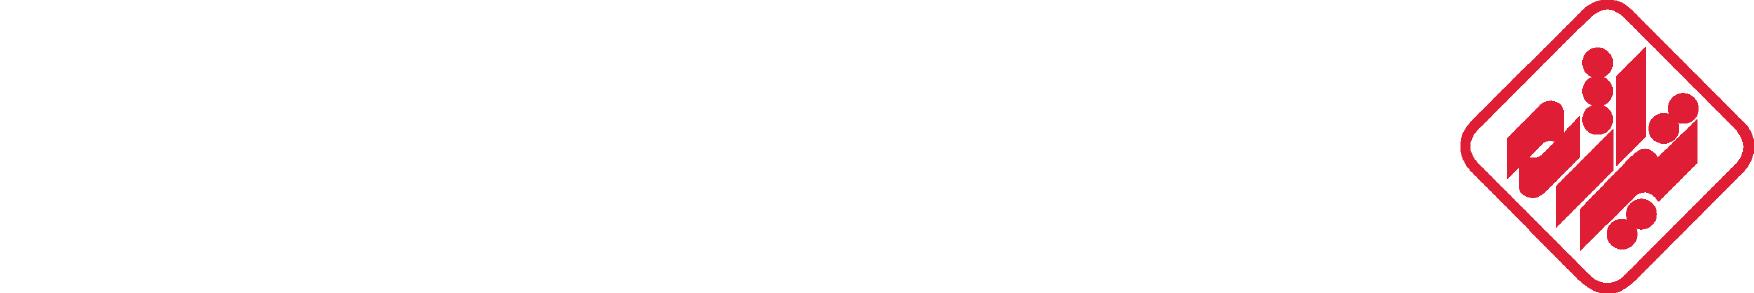 شرکت تیراژه چاپ تبریز